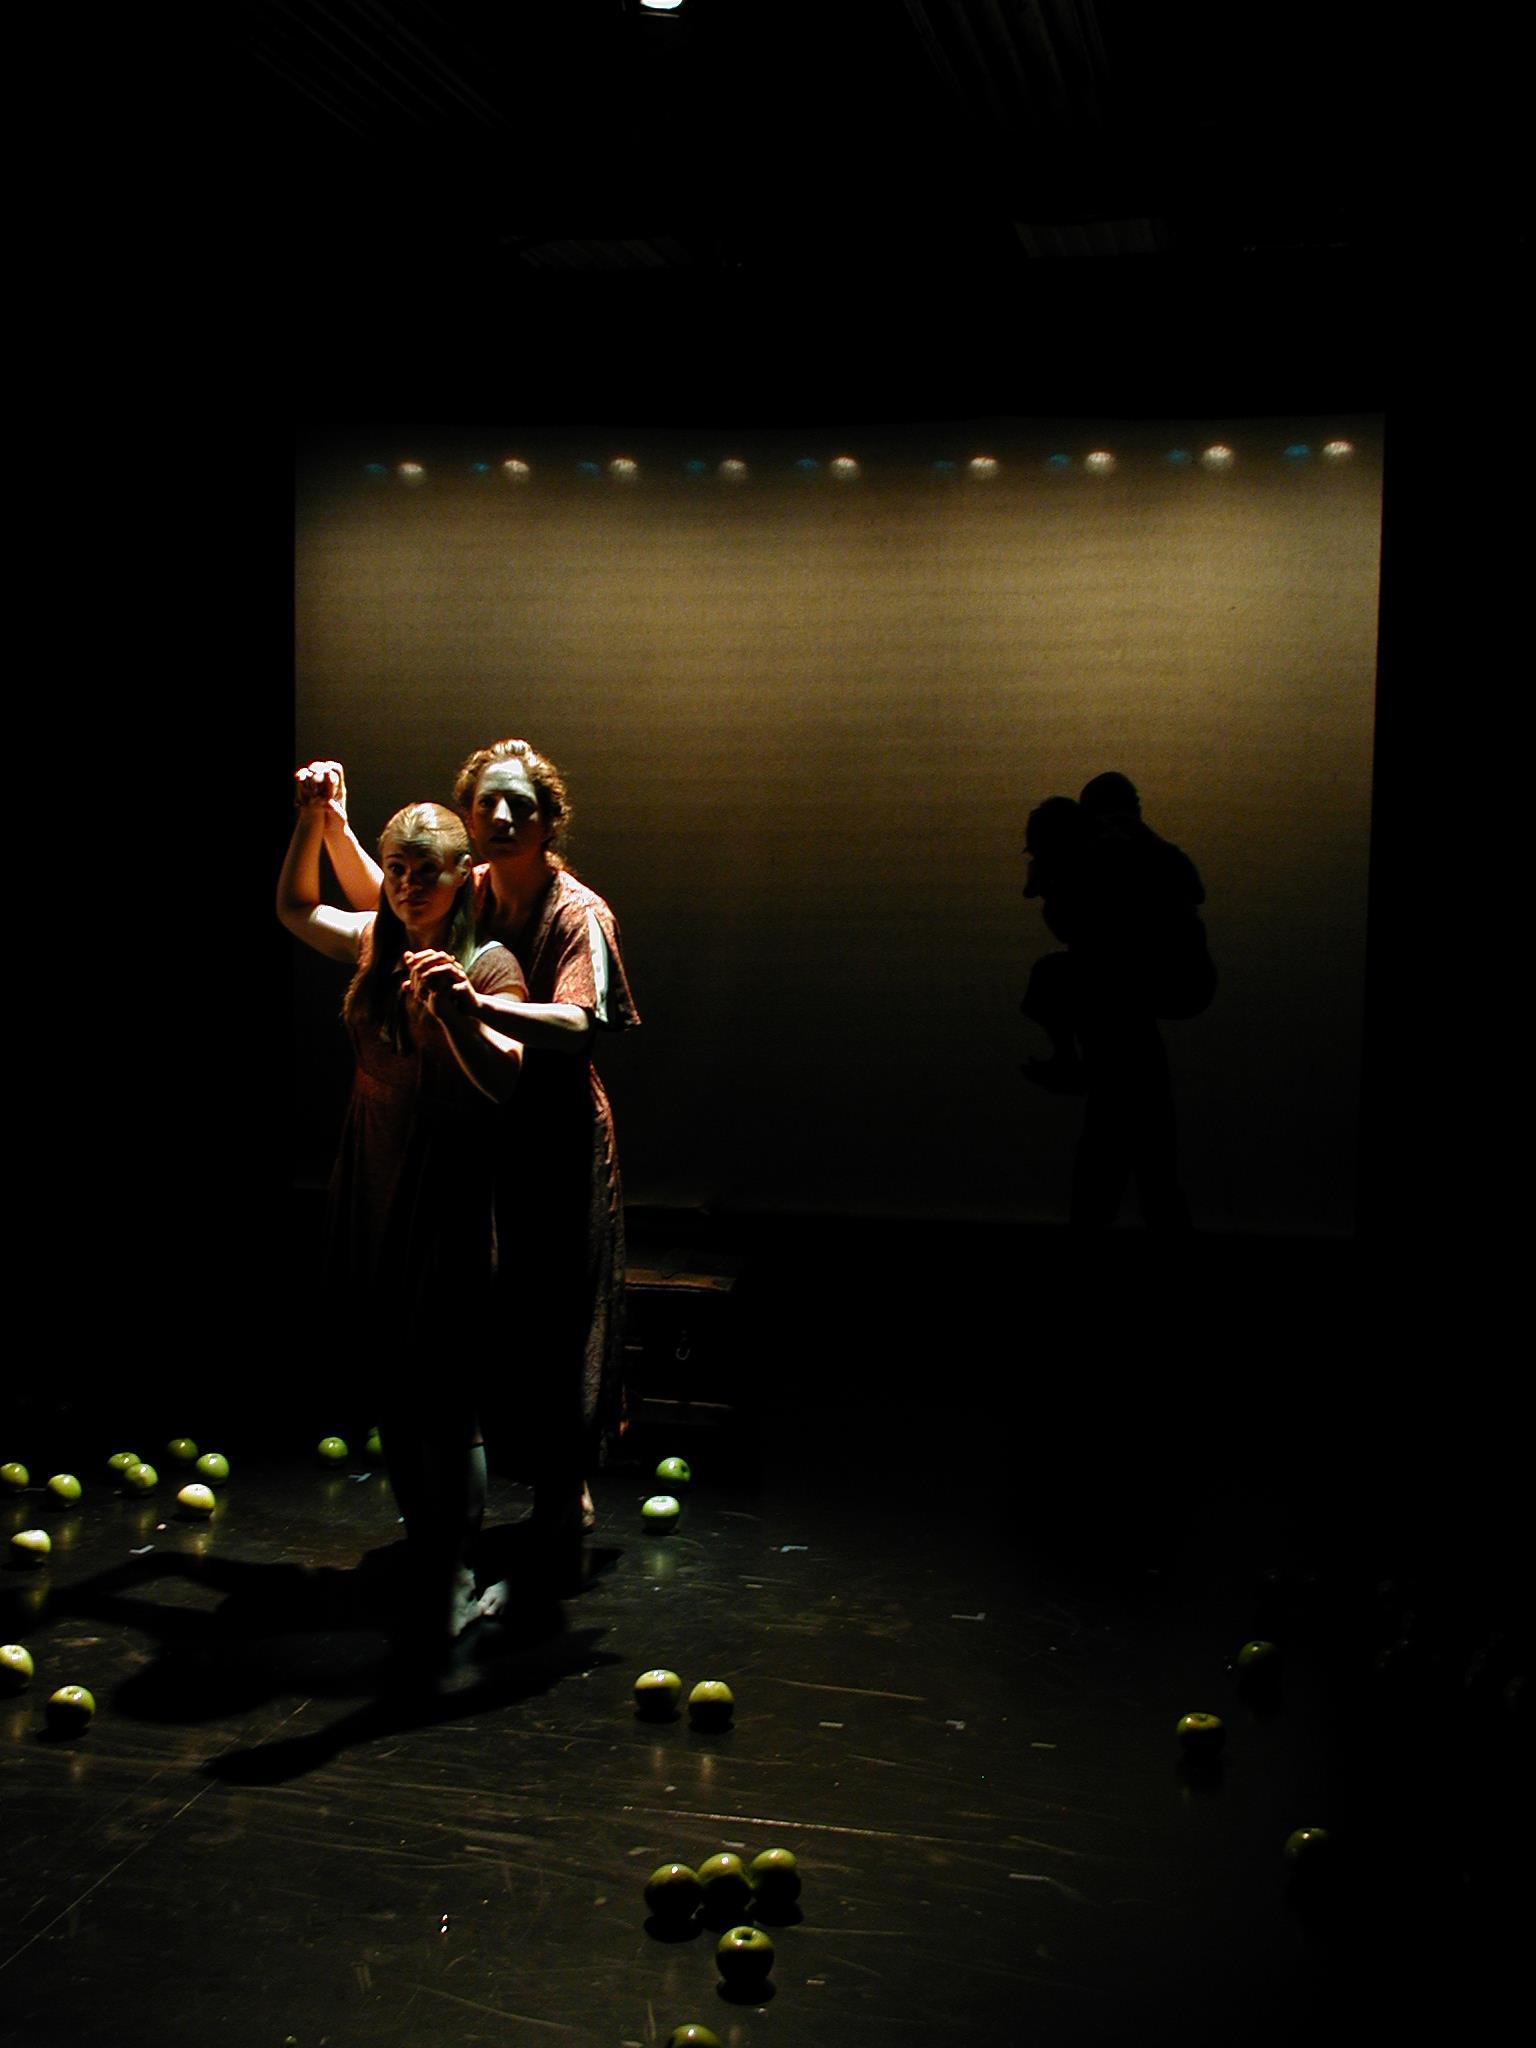 THE SECRET OF STEEP RAVINES Julia Prud'homme, Genna Brocone (foreground), Kameron Steele, Patrick Lacey (background). Photo by Ilona Somogyi.